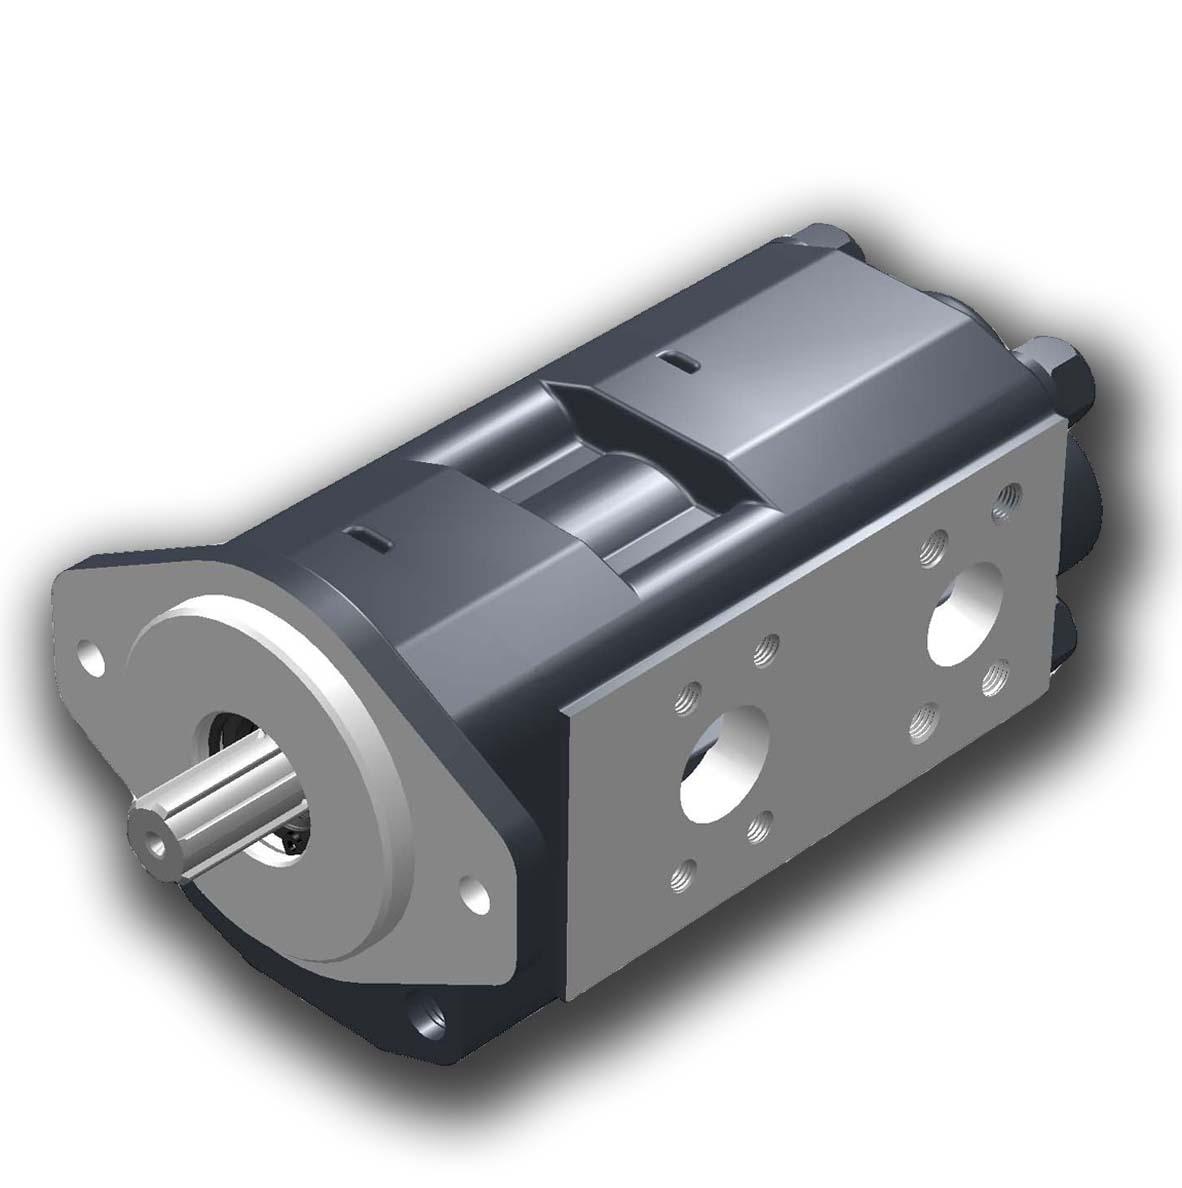 Hpt2 high pressure sleeve bushing pumps and motors hpt2 for Parker pumps and motors